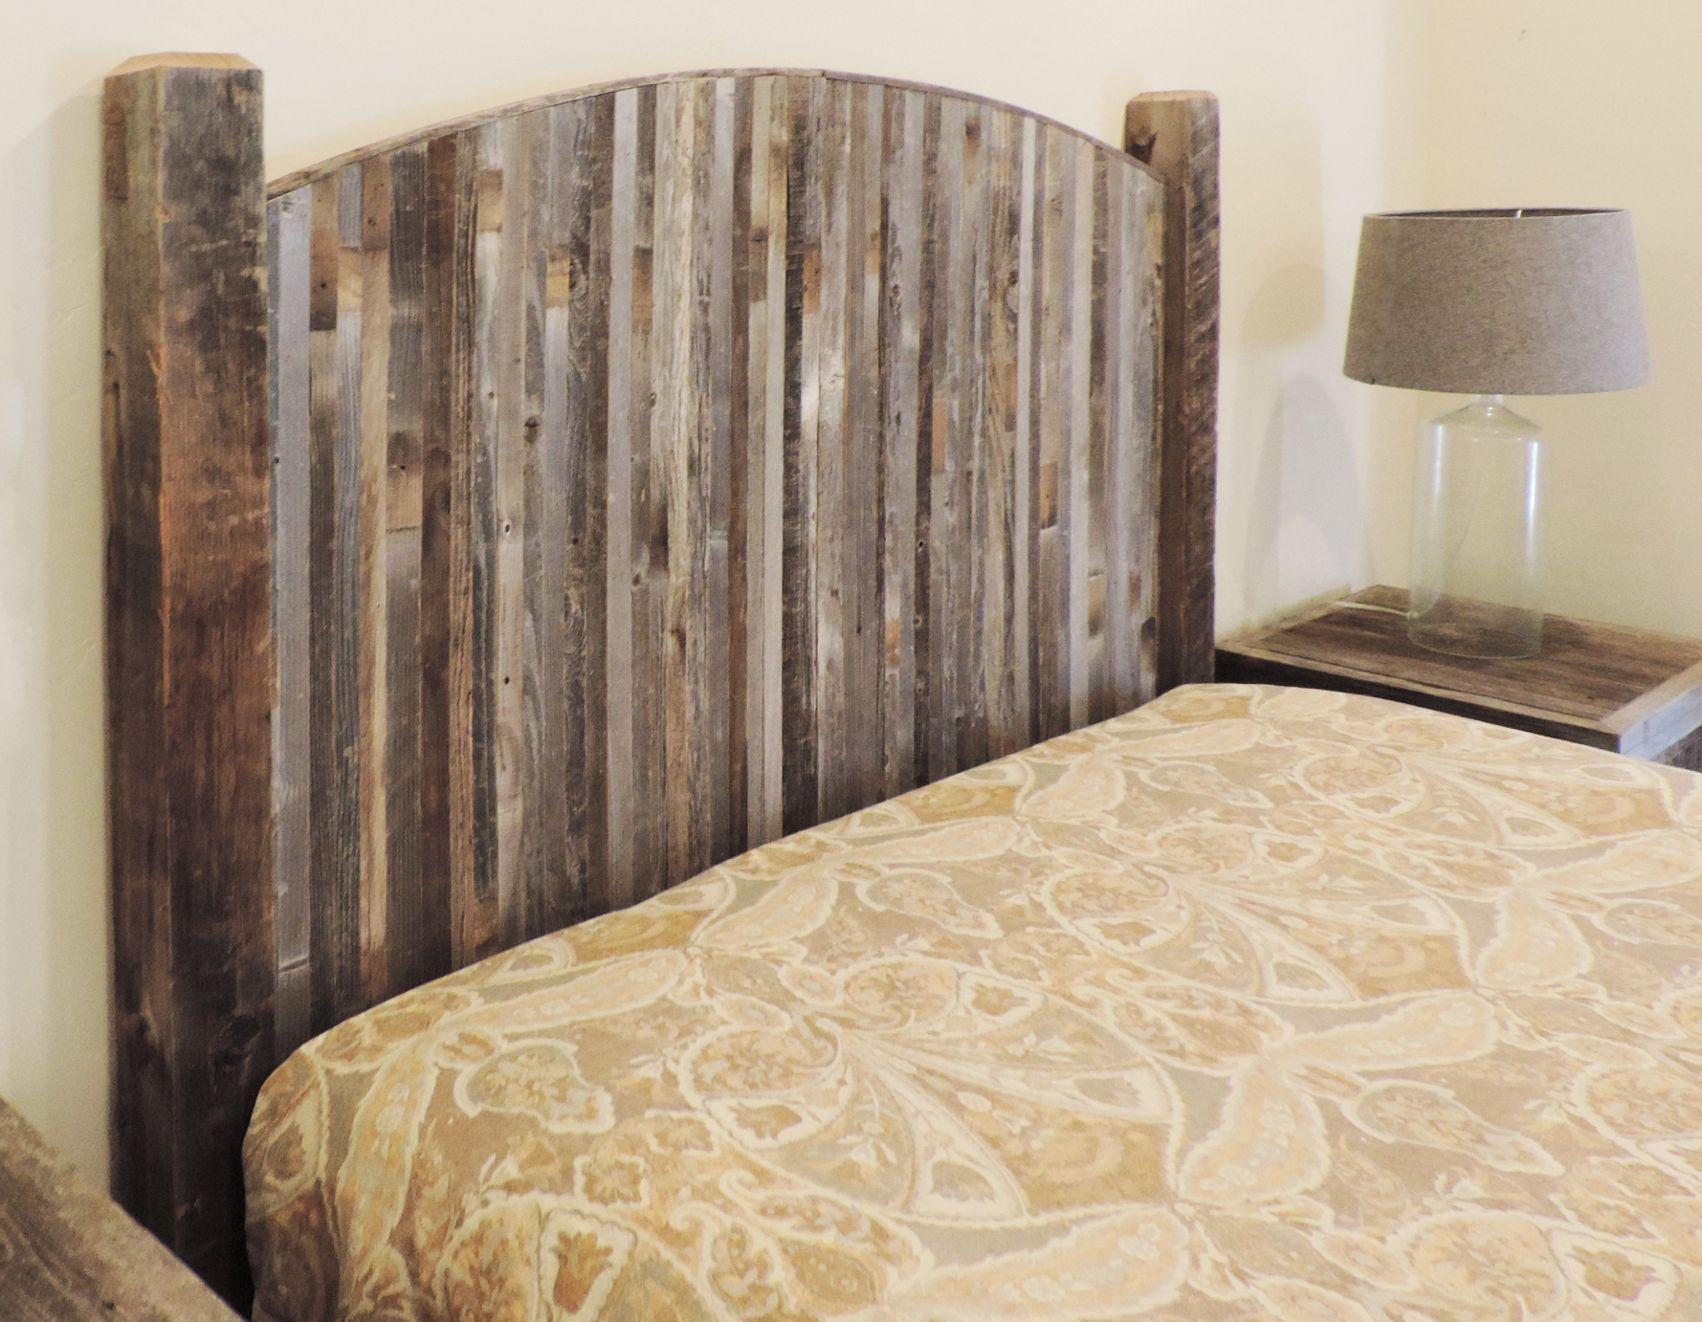 Farmhouse Style Arched Twin Bed Barn Wood Headboard W Narrow Rustic Reclaimed Wood Slats Diy Wood Headboard Bedroom Furniture Sets Reclaimed Wood Headboard